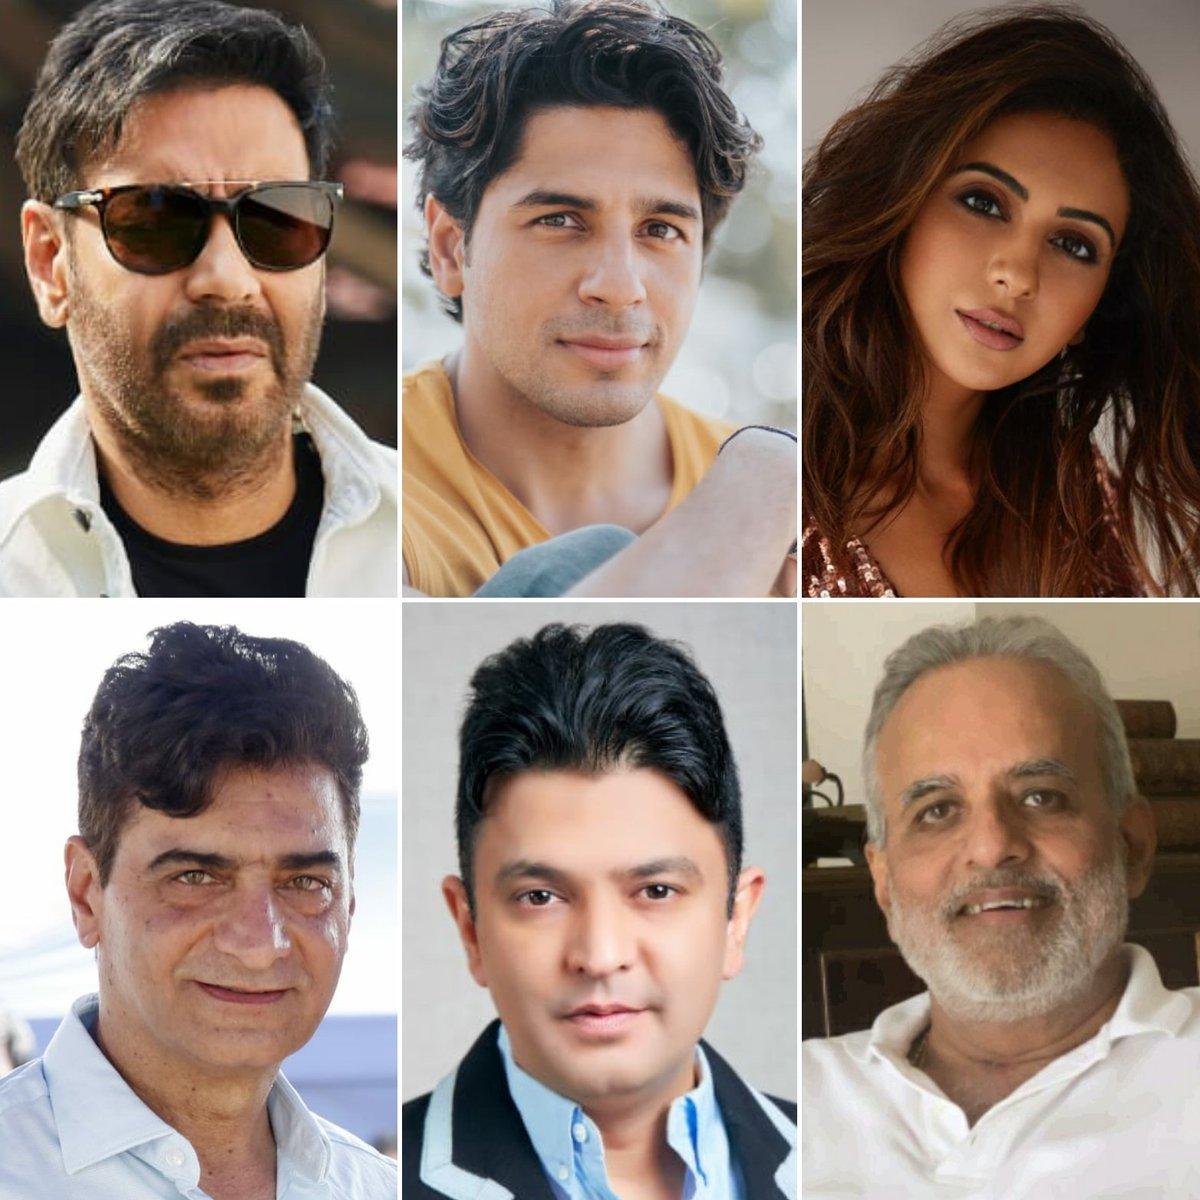 #AjayDevgn, #SidharthMalhotra & #RakulPreetSingh teams up for slice of life comedy officially titled #ThankGod.   Directed by #IndraKumar  Shoot begins 21 Jan 2021  @ajaydevgn @SidMalhotra @Rakulpreet @Indra_kumar_9 #BhushanKumar #KrishanKumar #AshokThakeria @SunirKheterpal